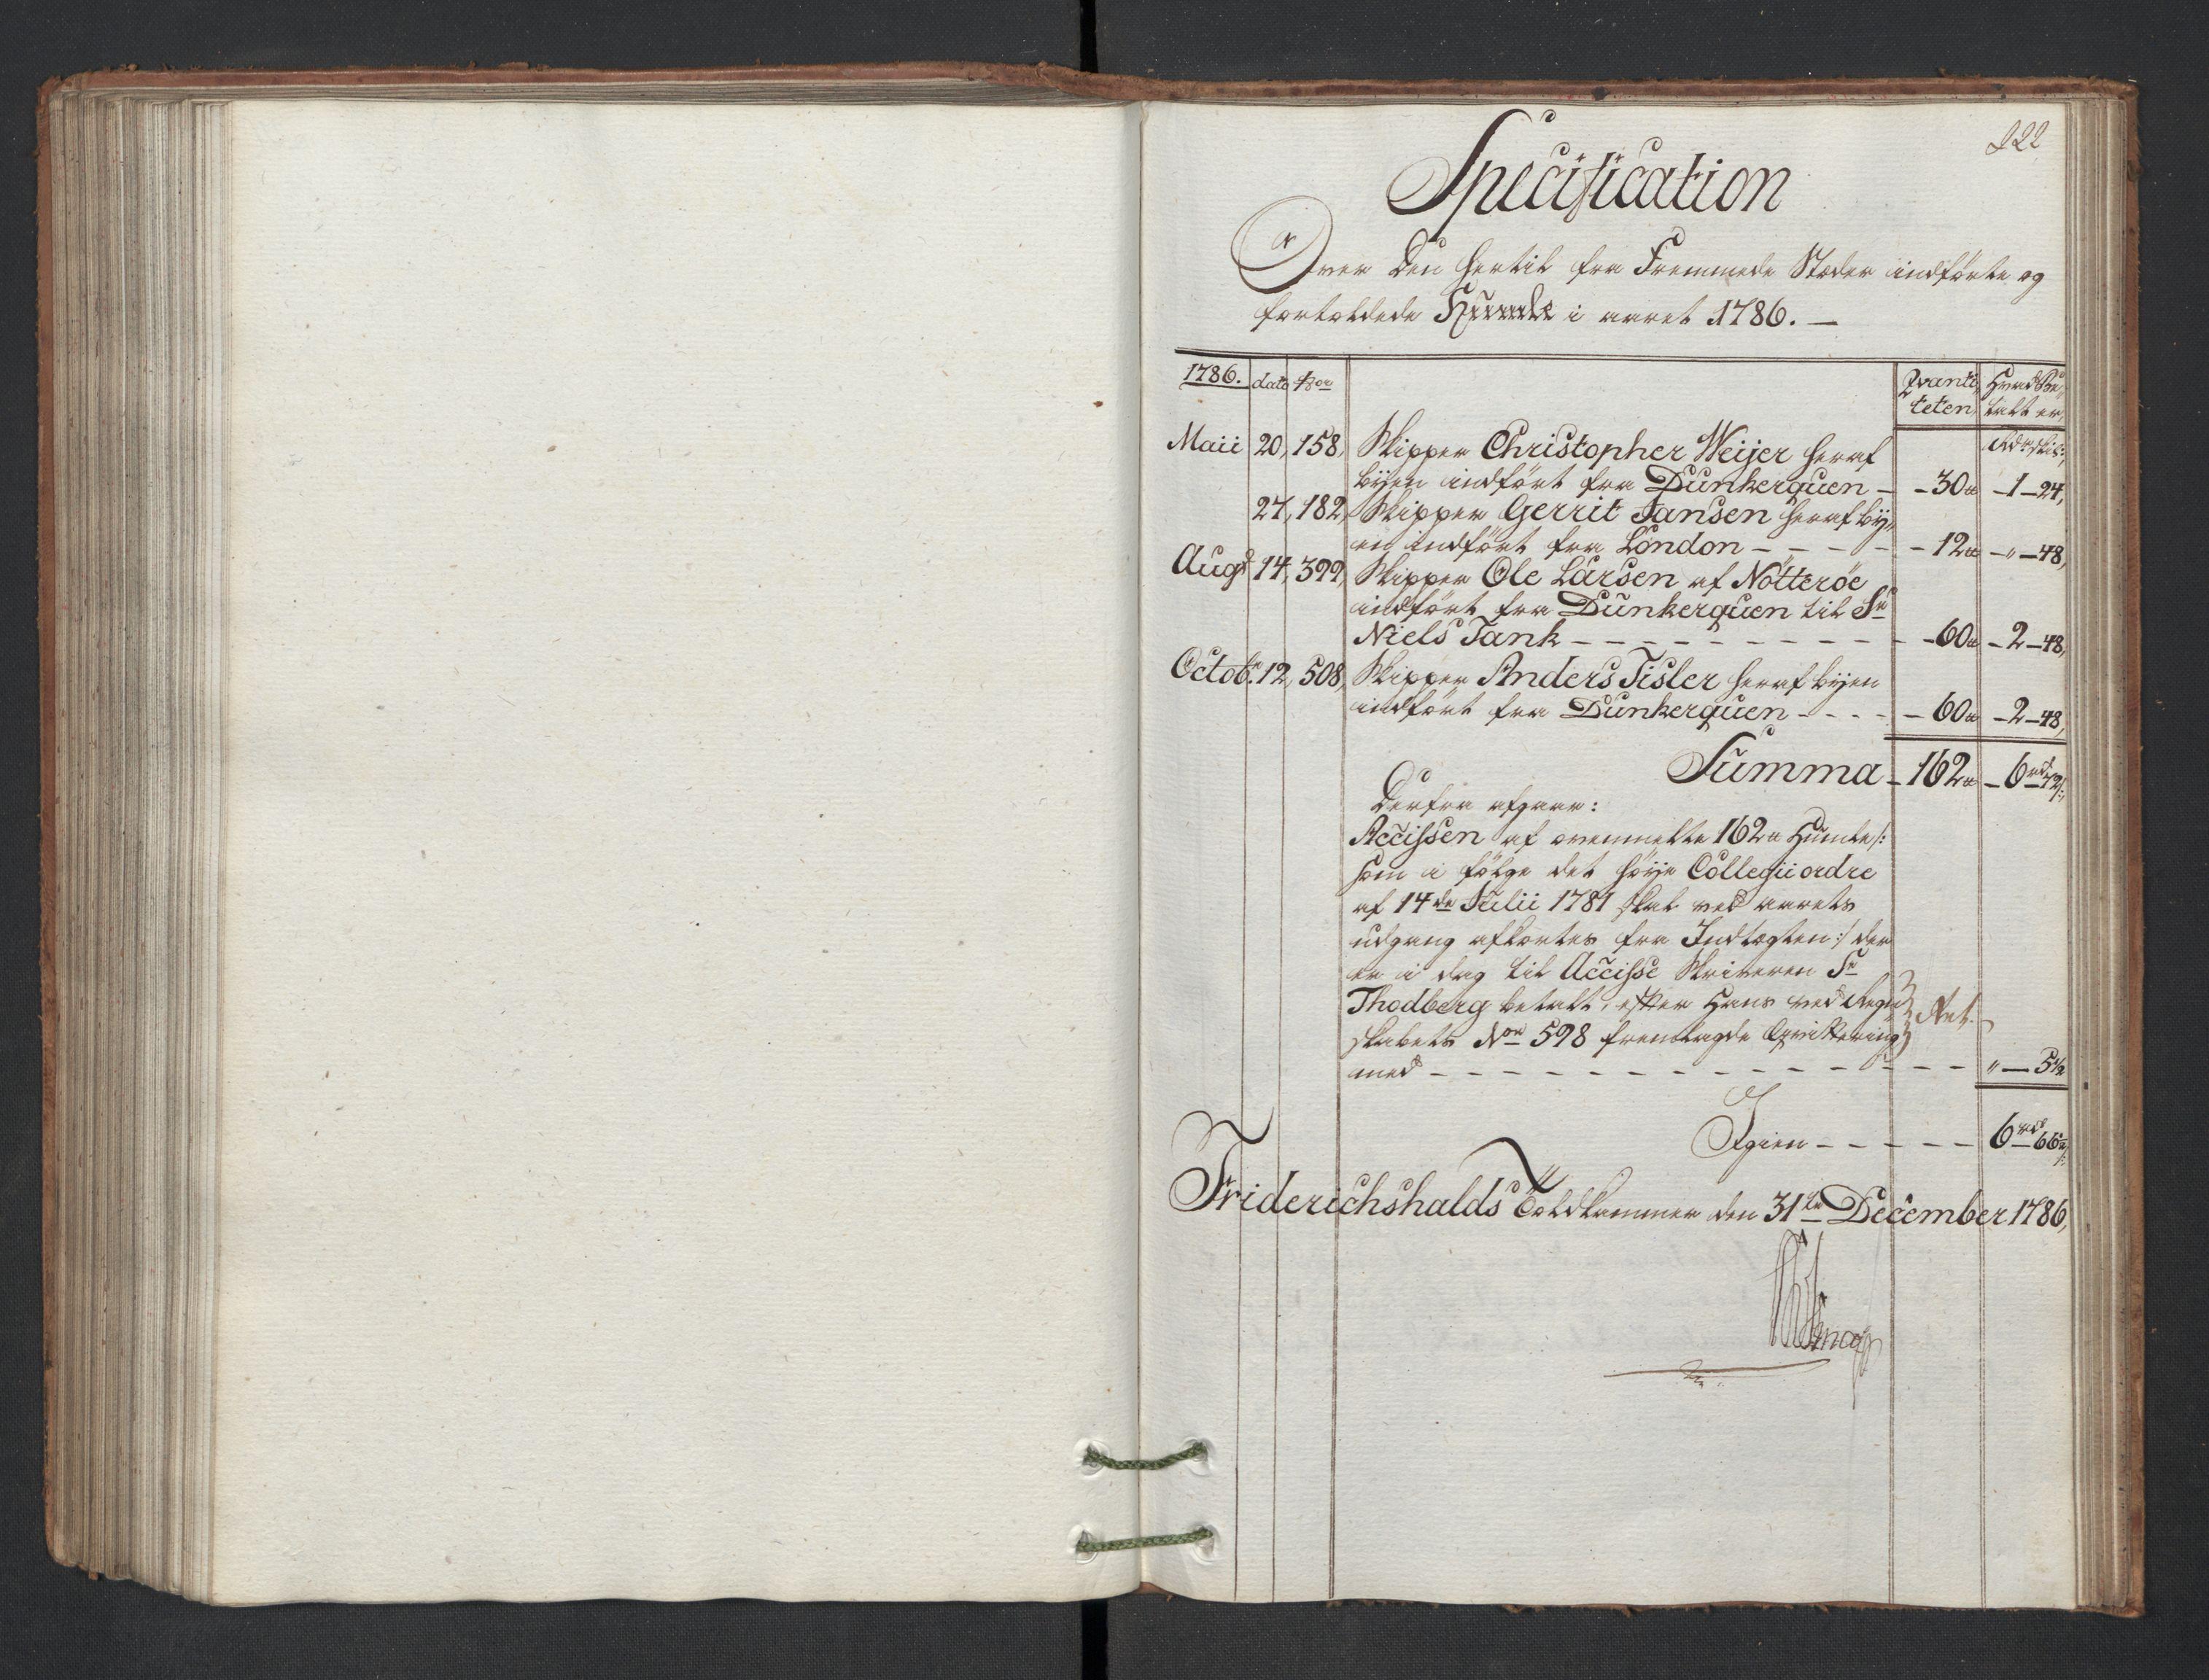 RA, Generaltollkammeret, tollregnskaper, R01/L0130: Tollregnskaper Fredrikshald, 1786, s. 221b-222a